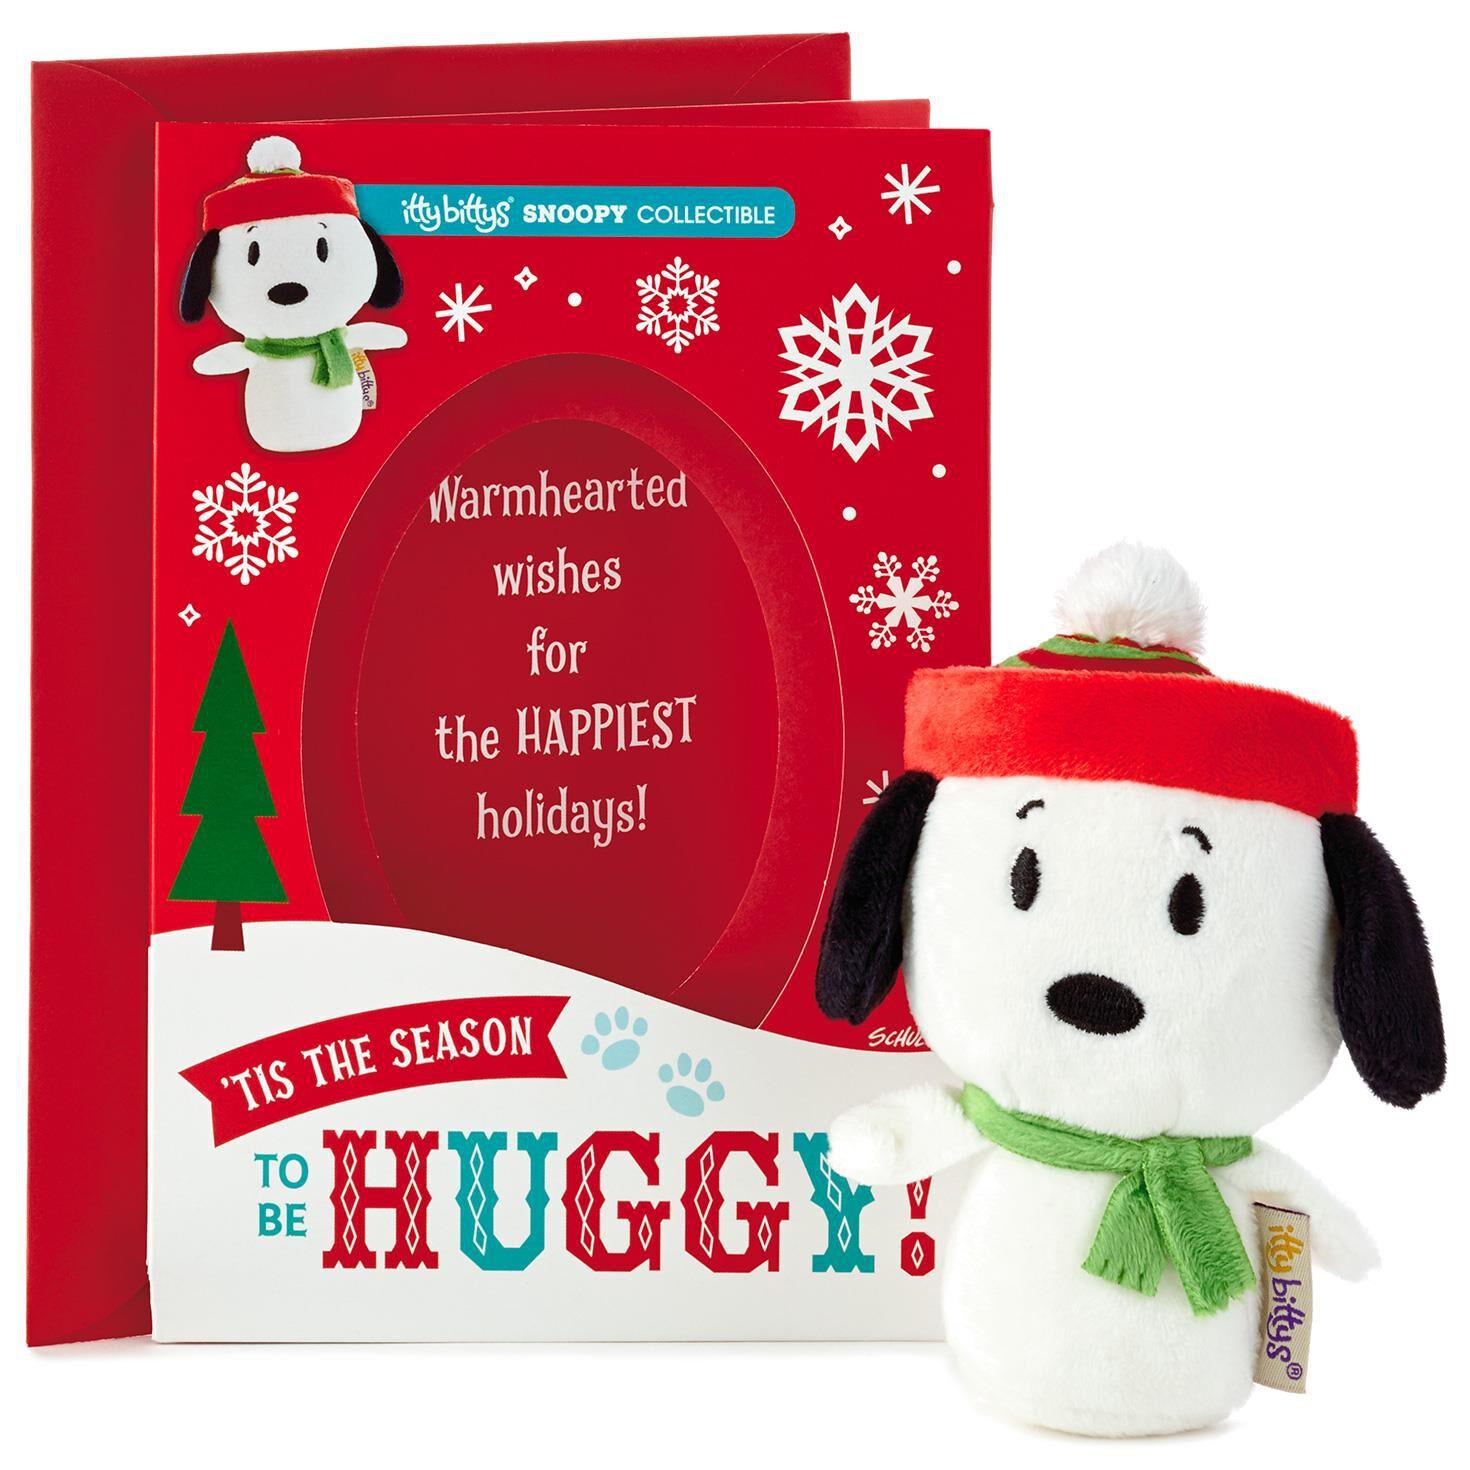 Hallmark Peanuts Christmas Holiday Greeting Cards - GotTeamDesigns